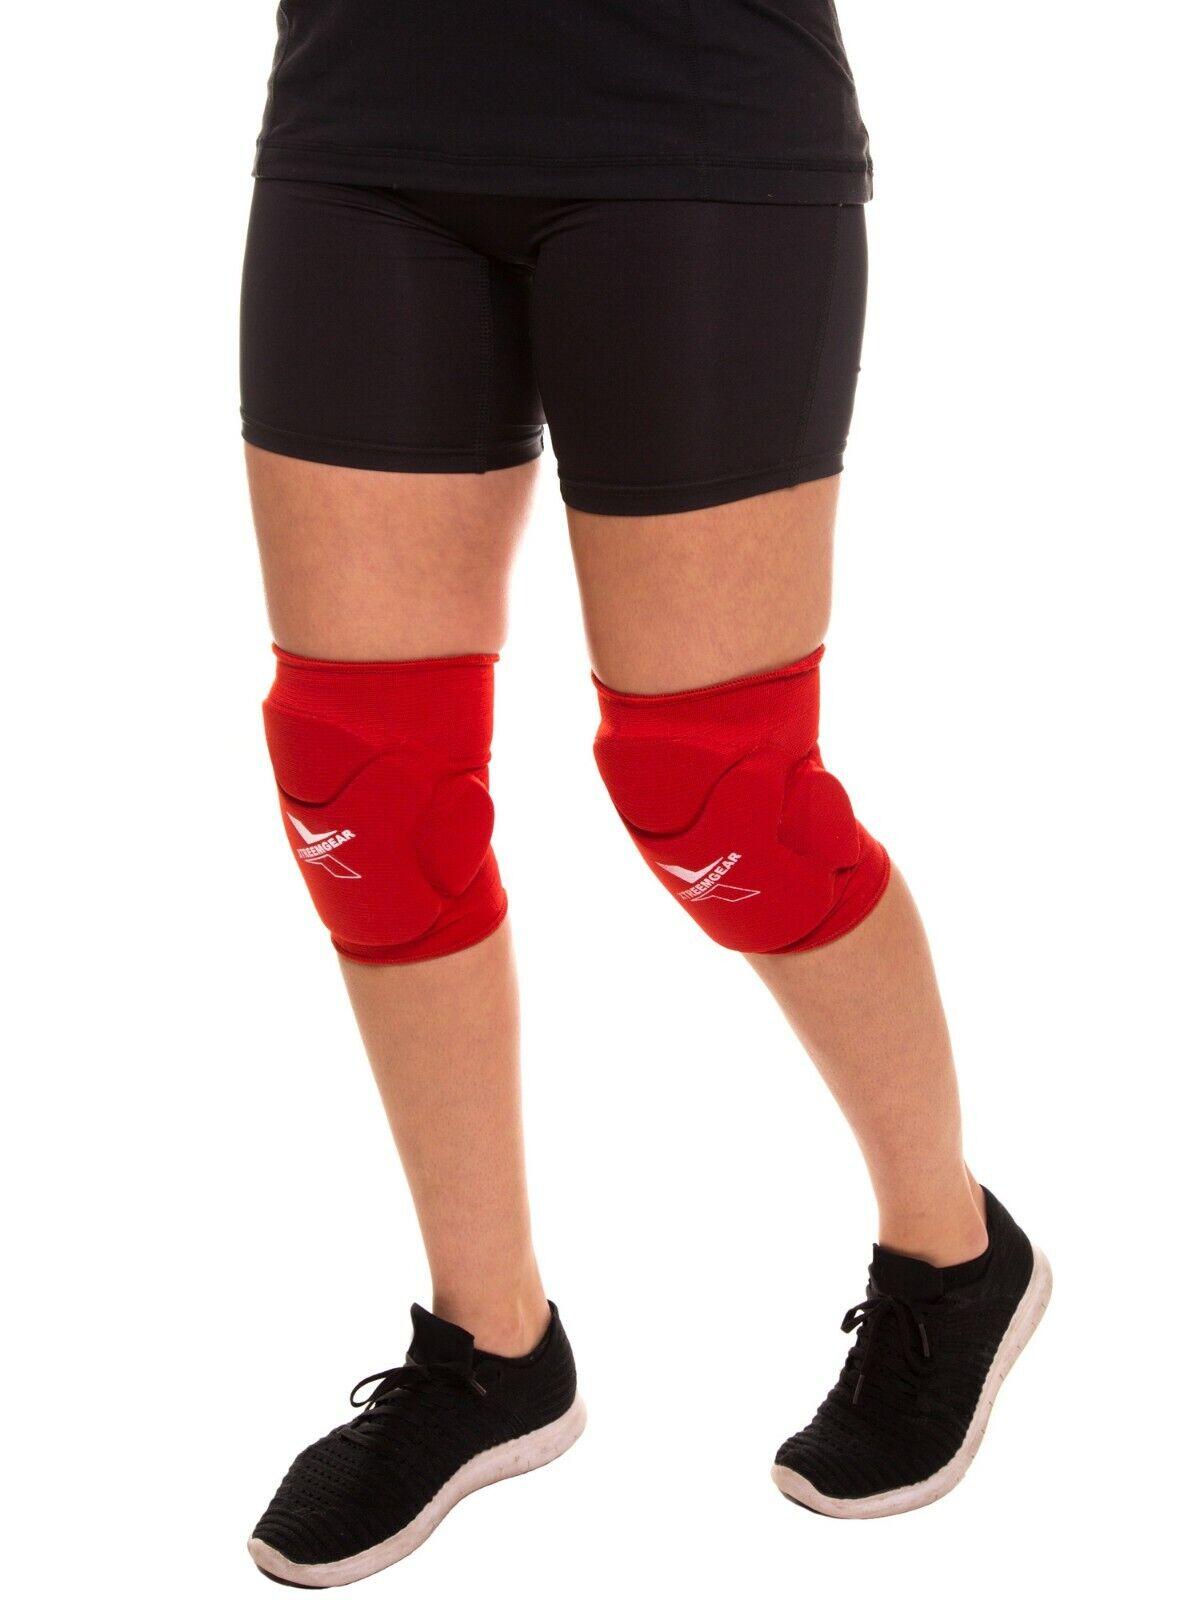 Protective Knee Pads Thick Sponge Anti-slip Knee Sleeve MMA